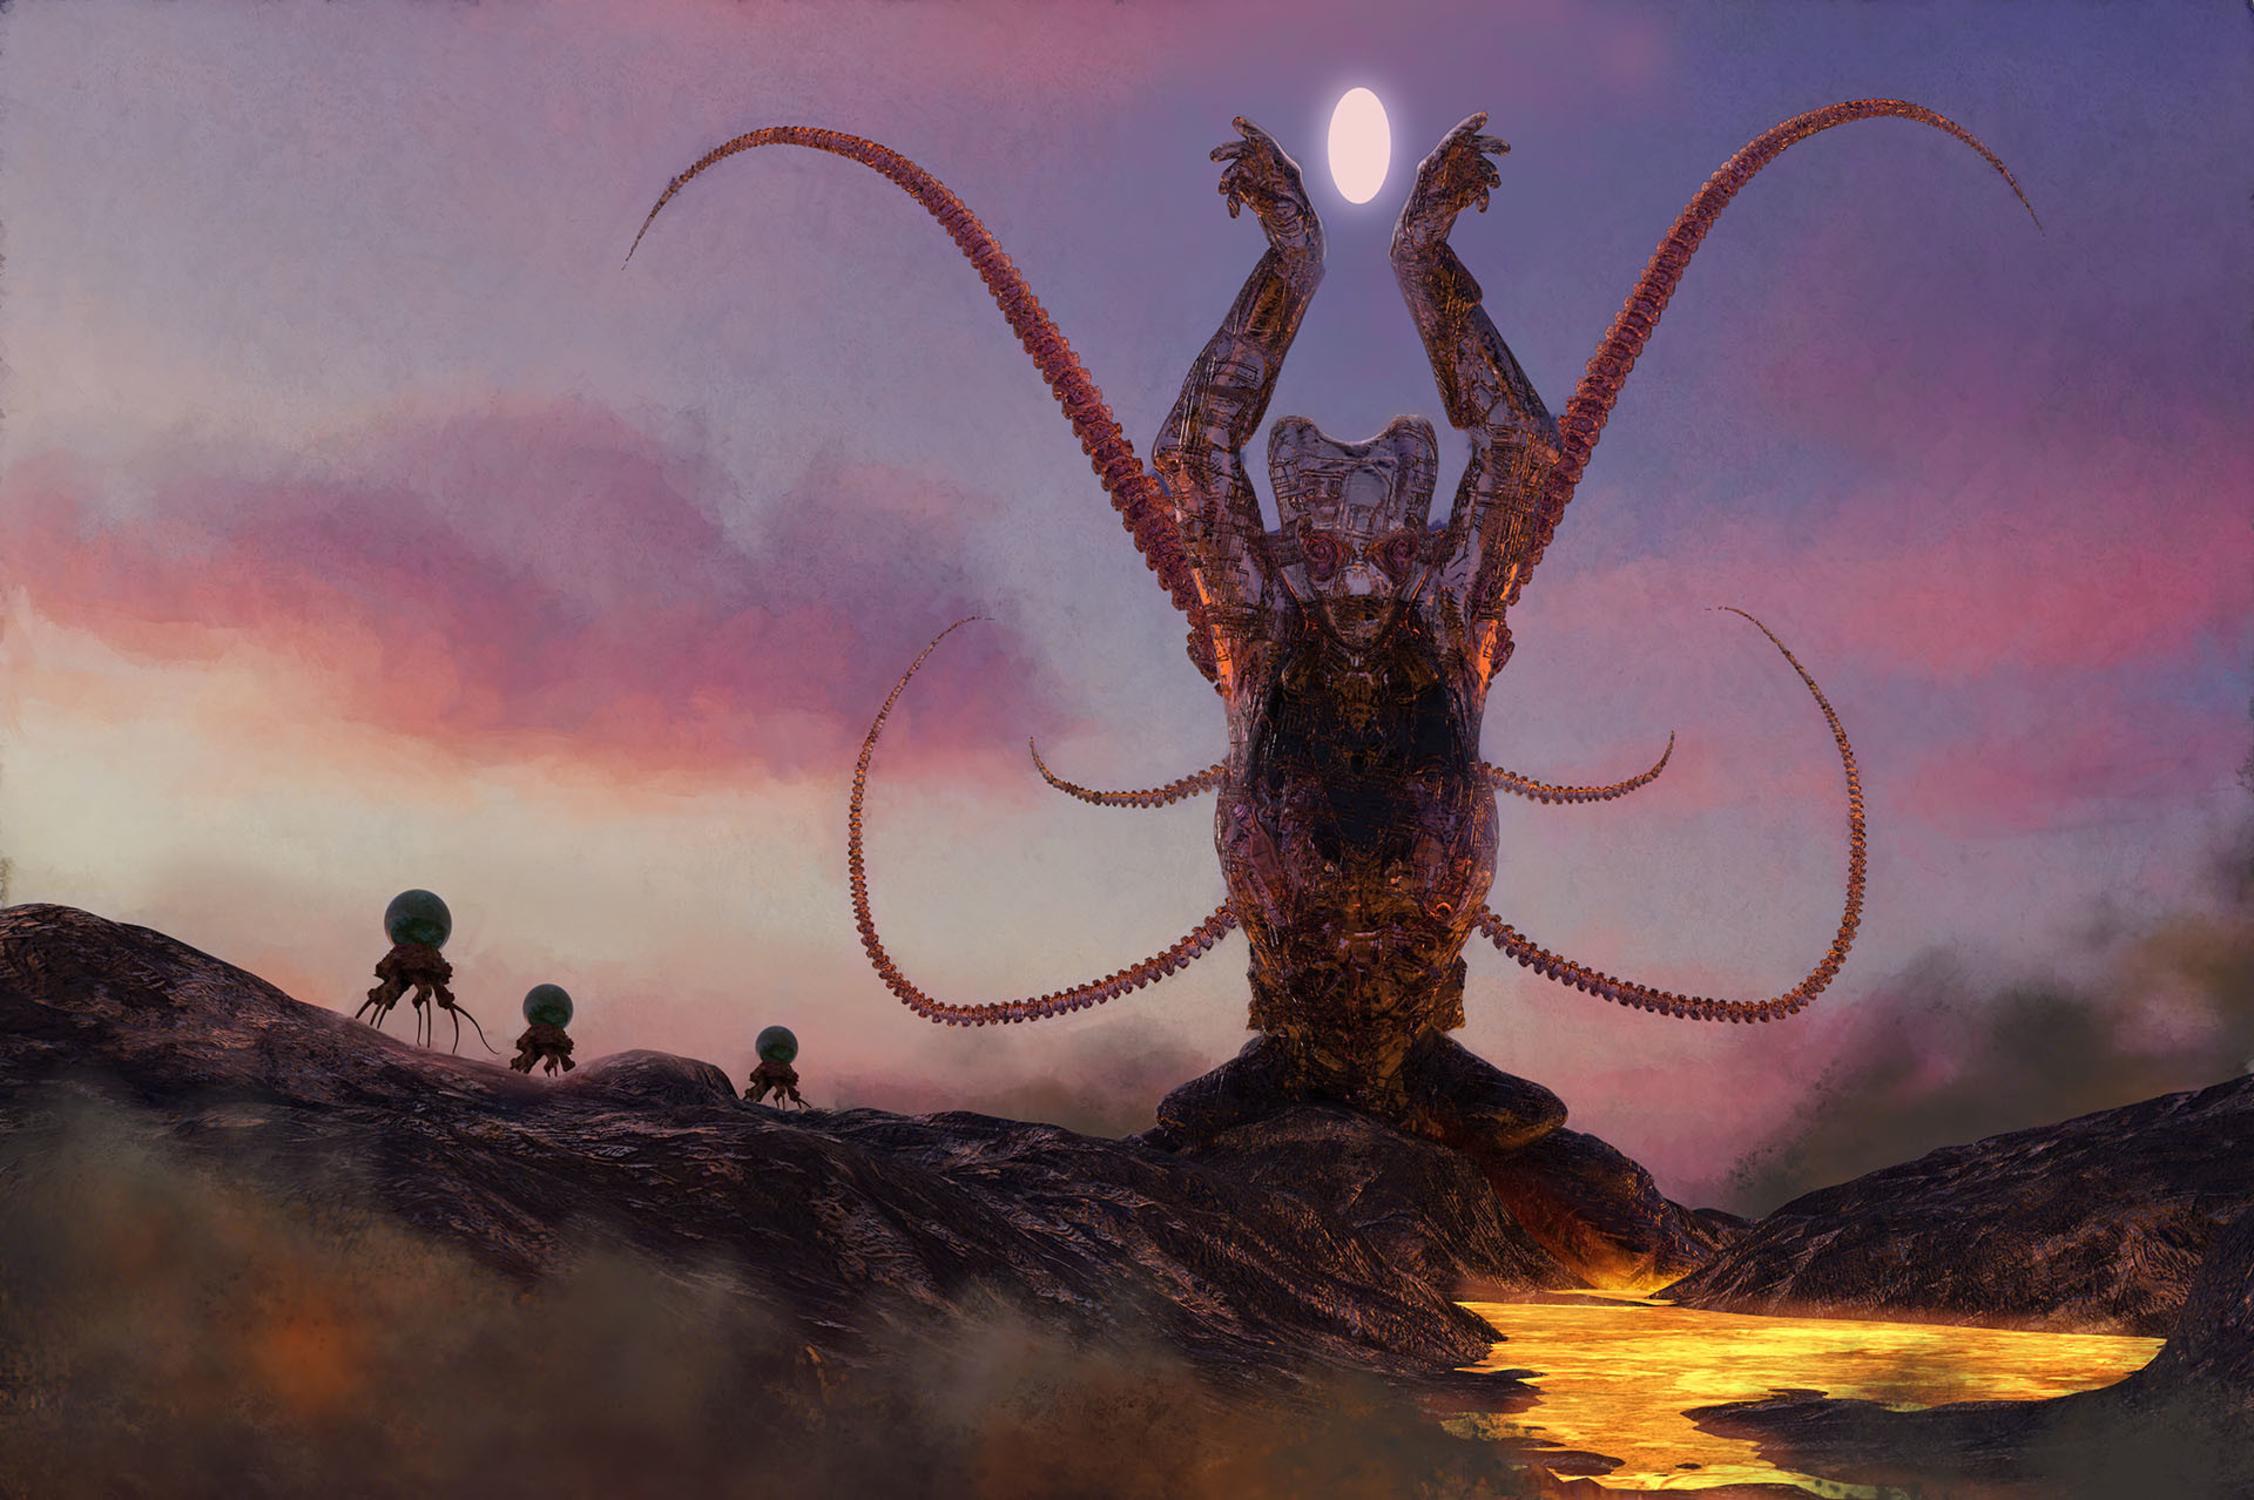 Strange Gods Artwork by Seth Rutledge